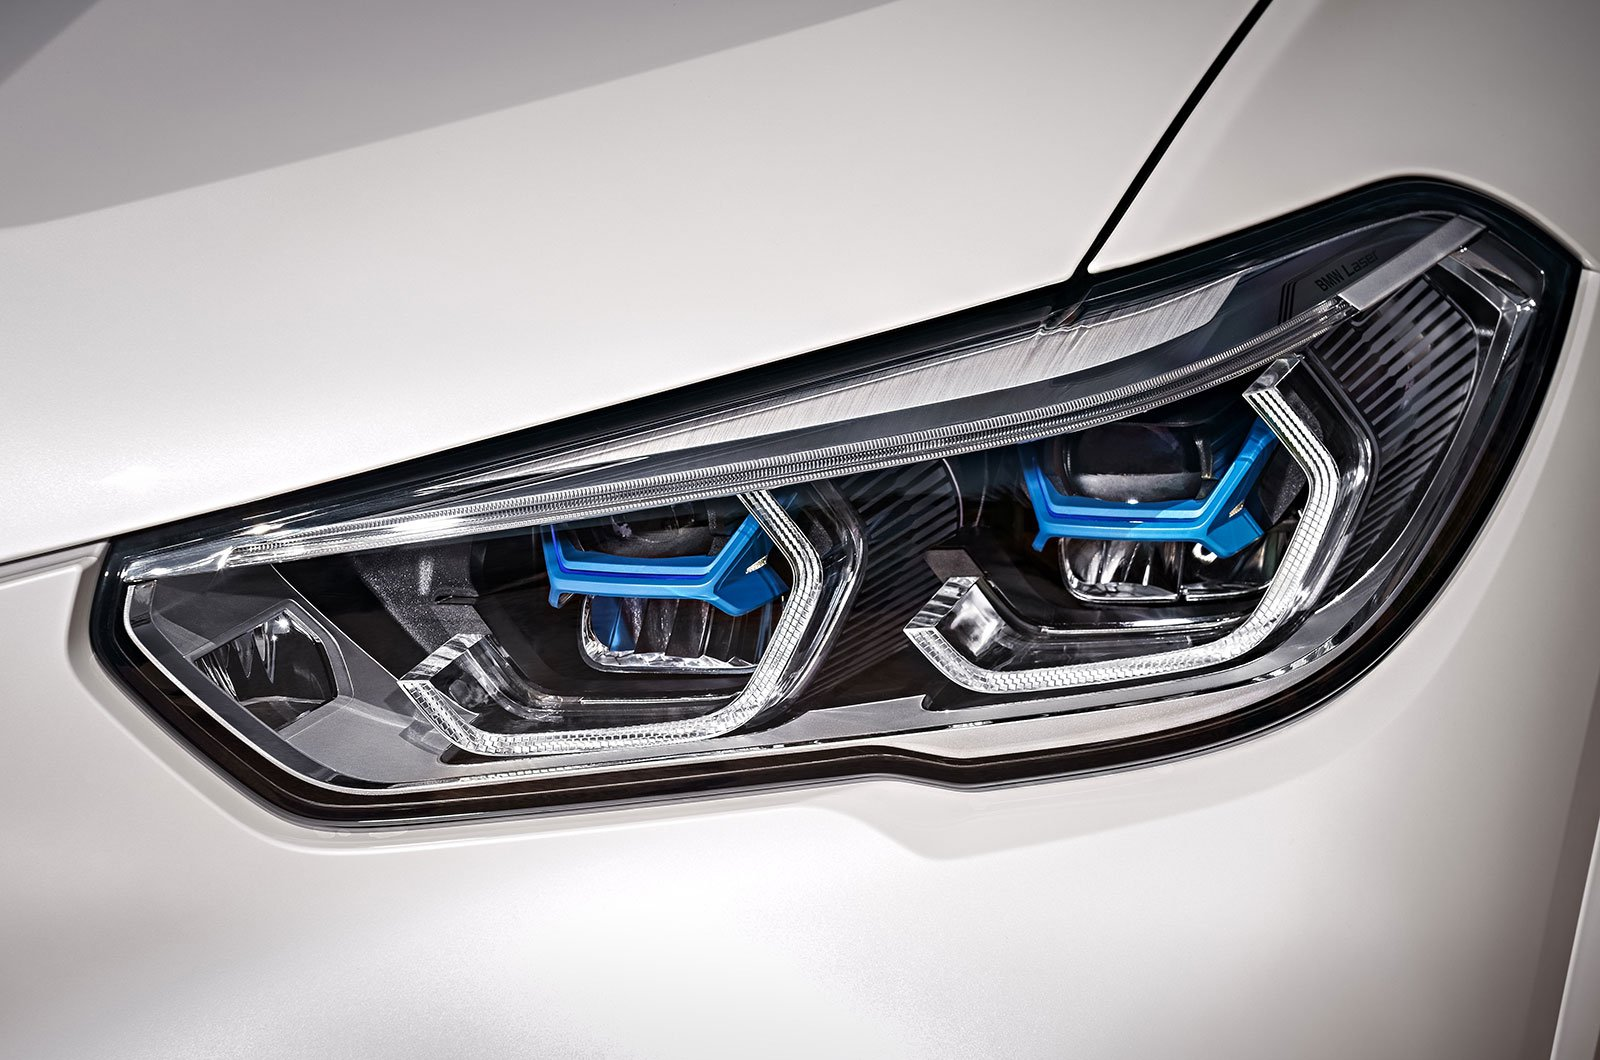 BMW X5 LED lights